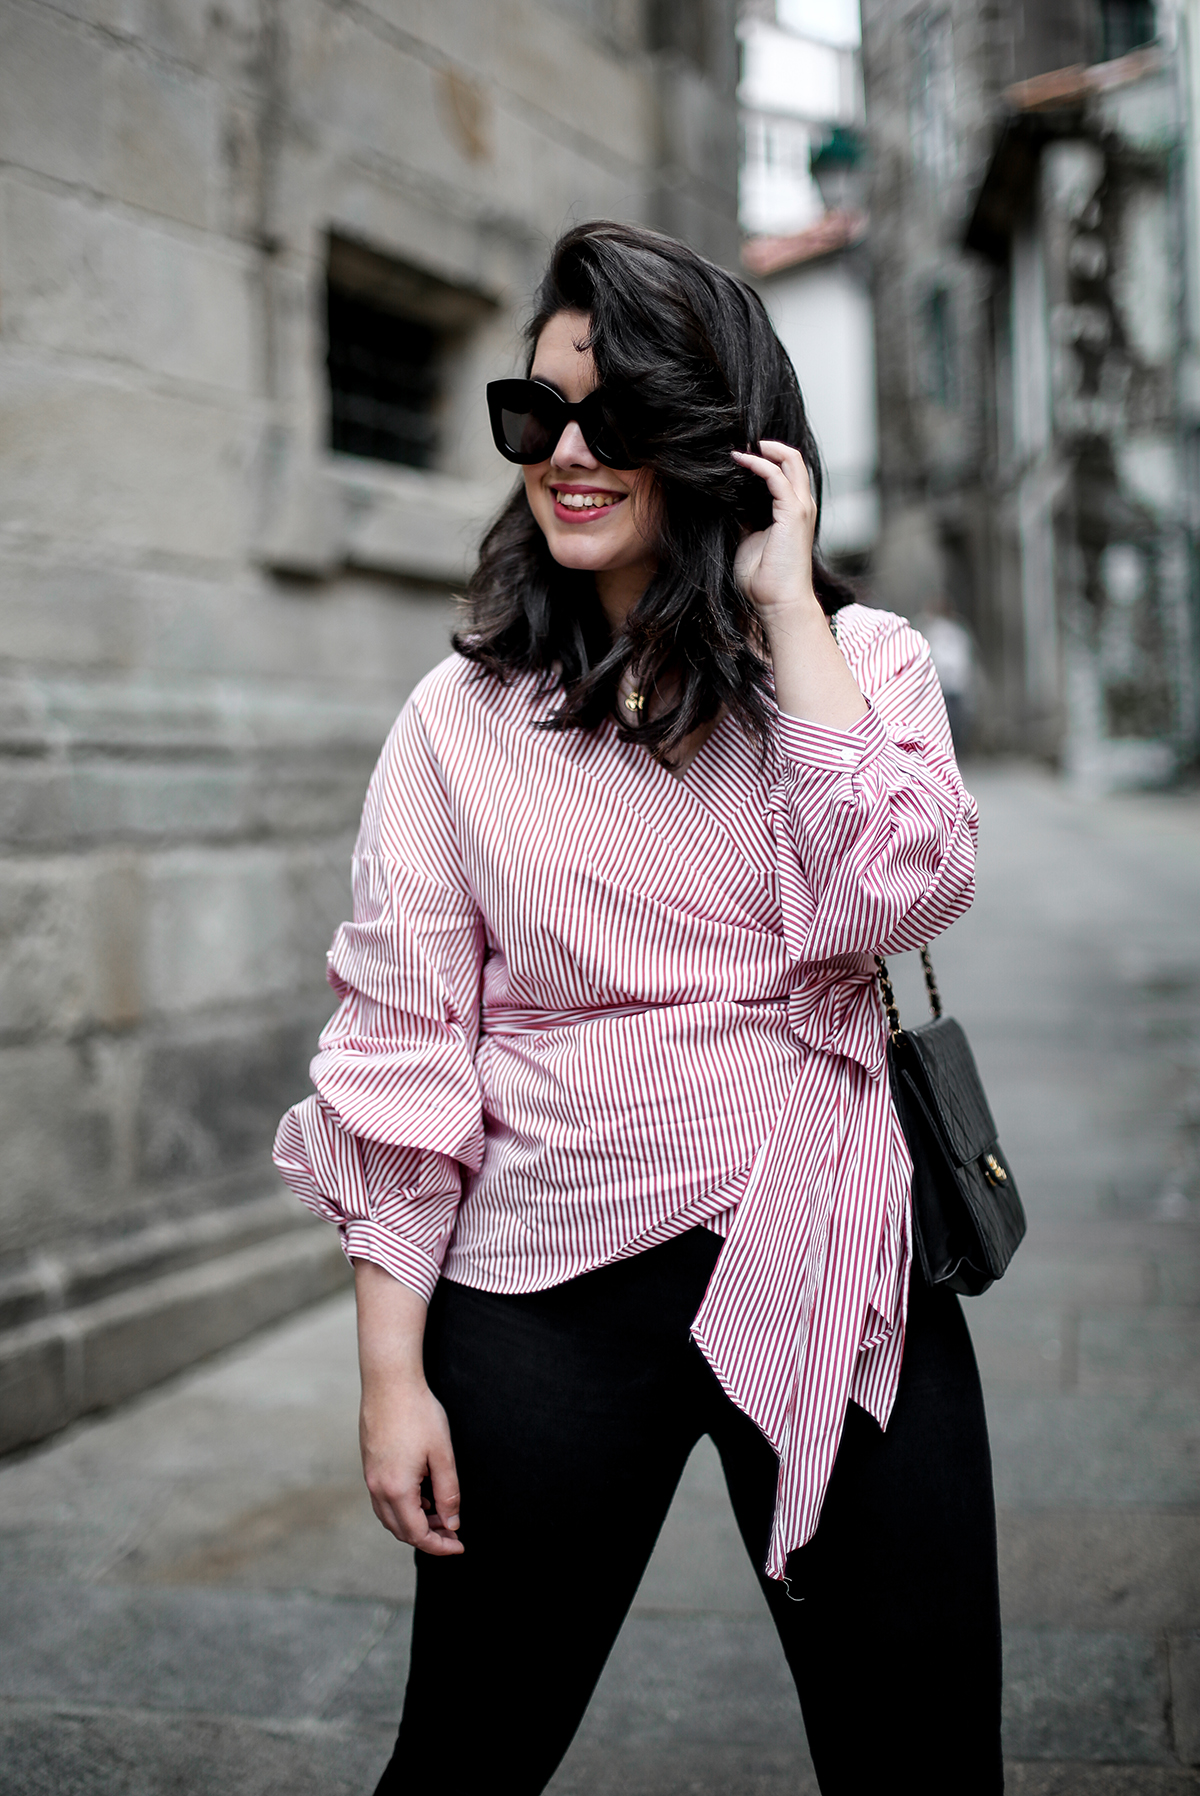 blusa-cruzada-zara-chanel-vintage-vestiaire-collective-myblueberrynightsblog5